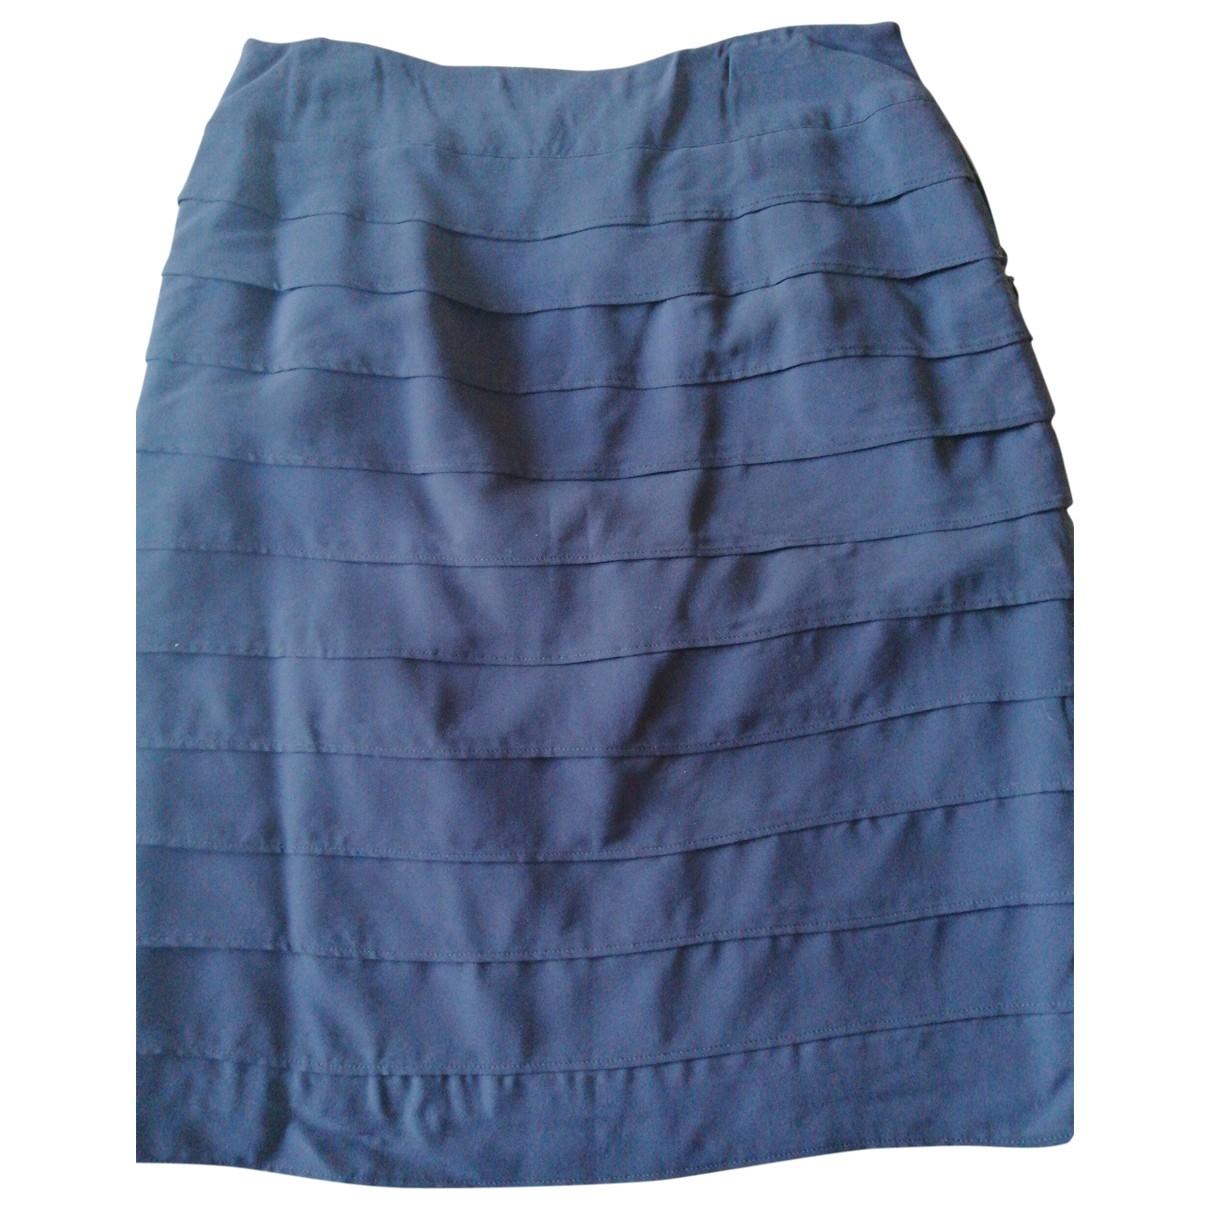 Claudie Pierlot \N Blue skirt for Women 2 0-5